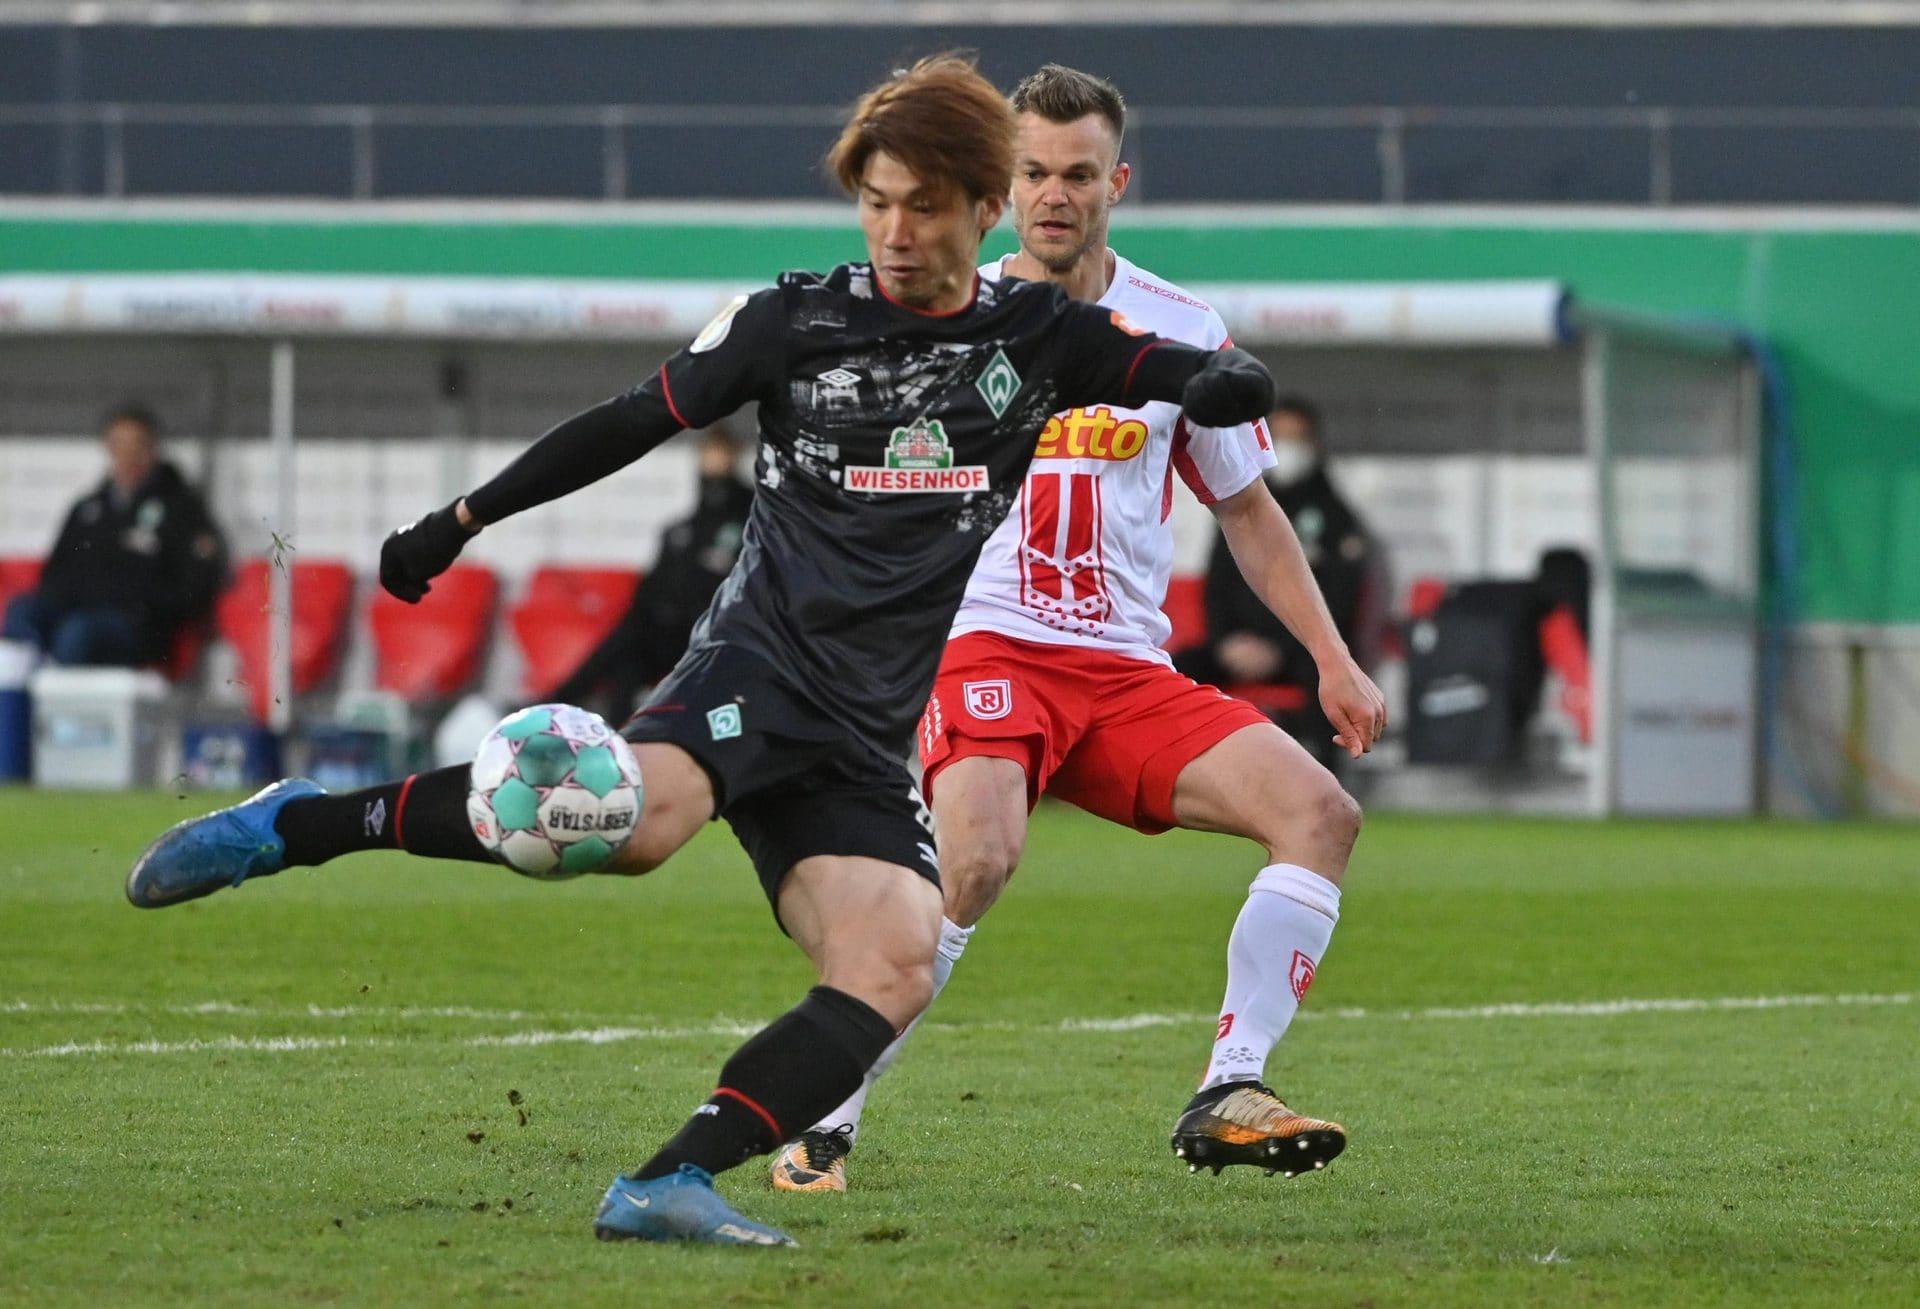 Werder bucht Halbfinal-Ticket gegen wackere Regensburger DFB-Pokal